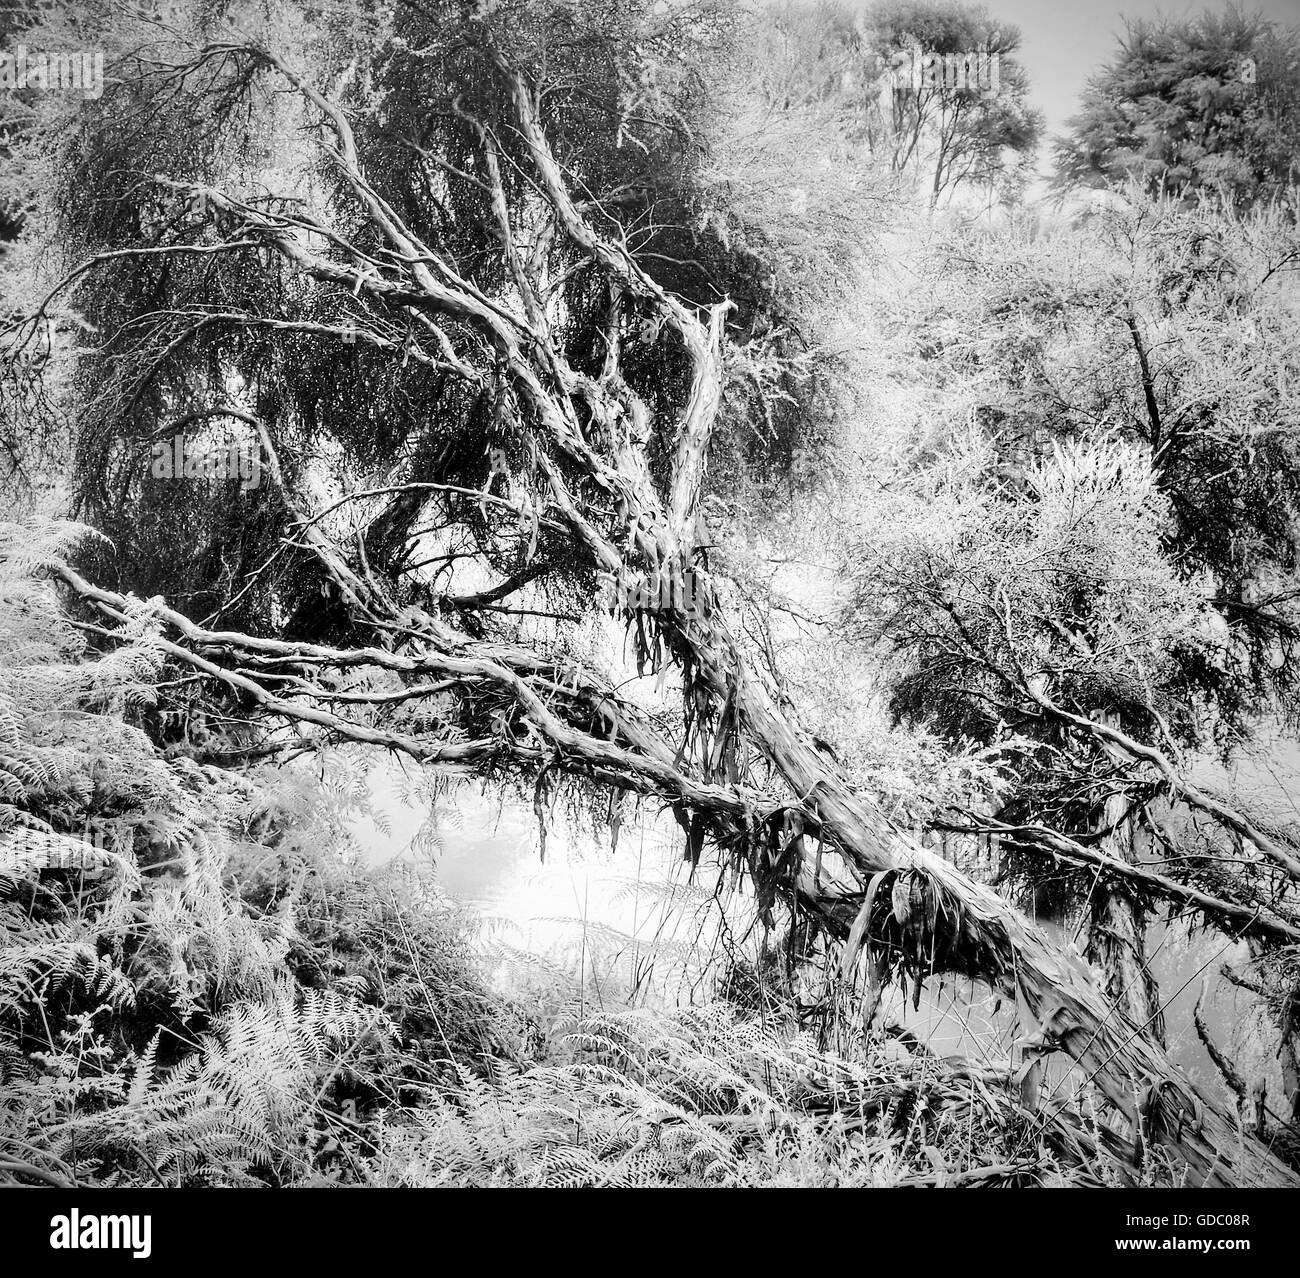 Rotorua,New Zealand,north island,tree,dead tree,jungle,rain forest,nature,primeval forest,black and white,Mystical,mo - Stock Image